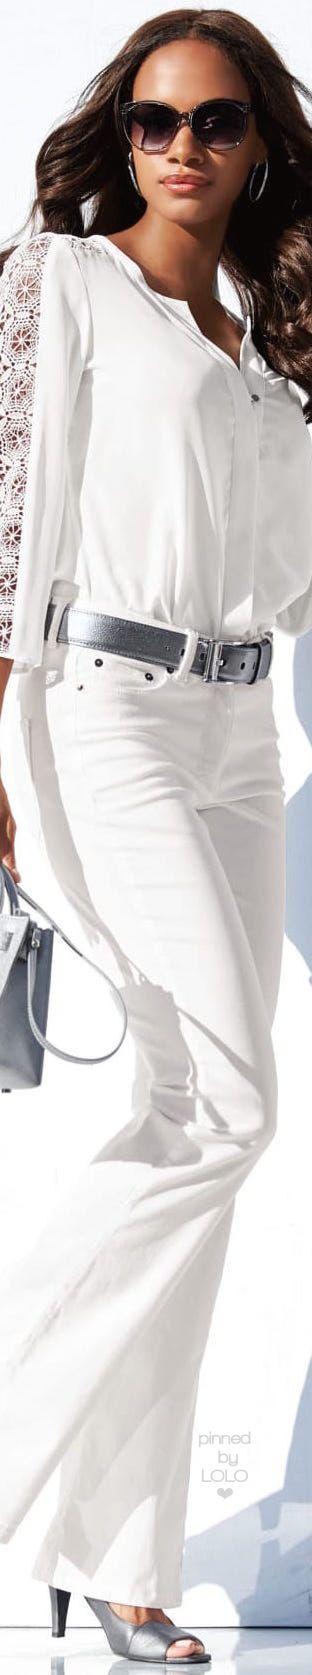 Madeleine | white women fashion outfit clothing style apparel @roressclothes closet ideas